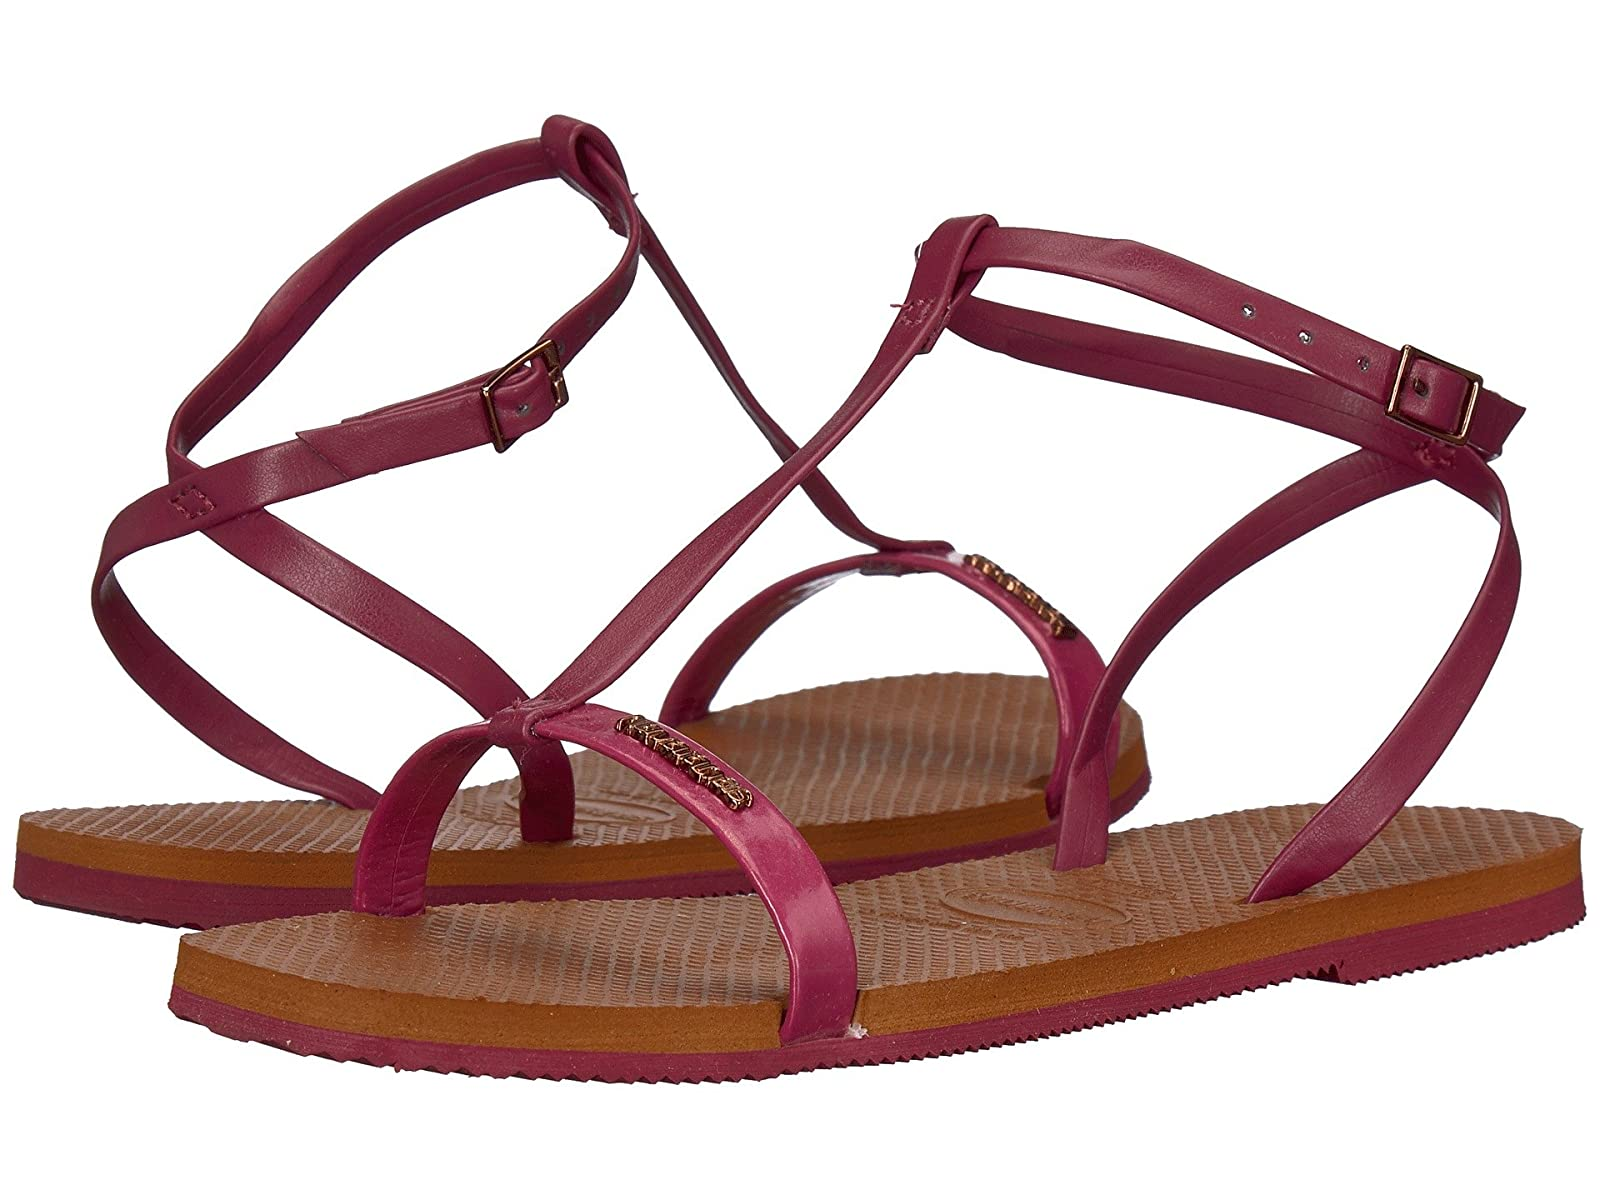 Havaianas You Belize Flip FlopsAtmospheric grades have affordable shoes